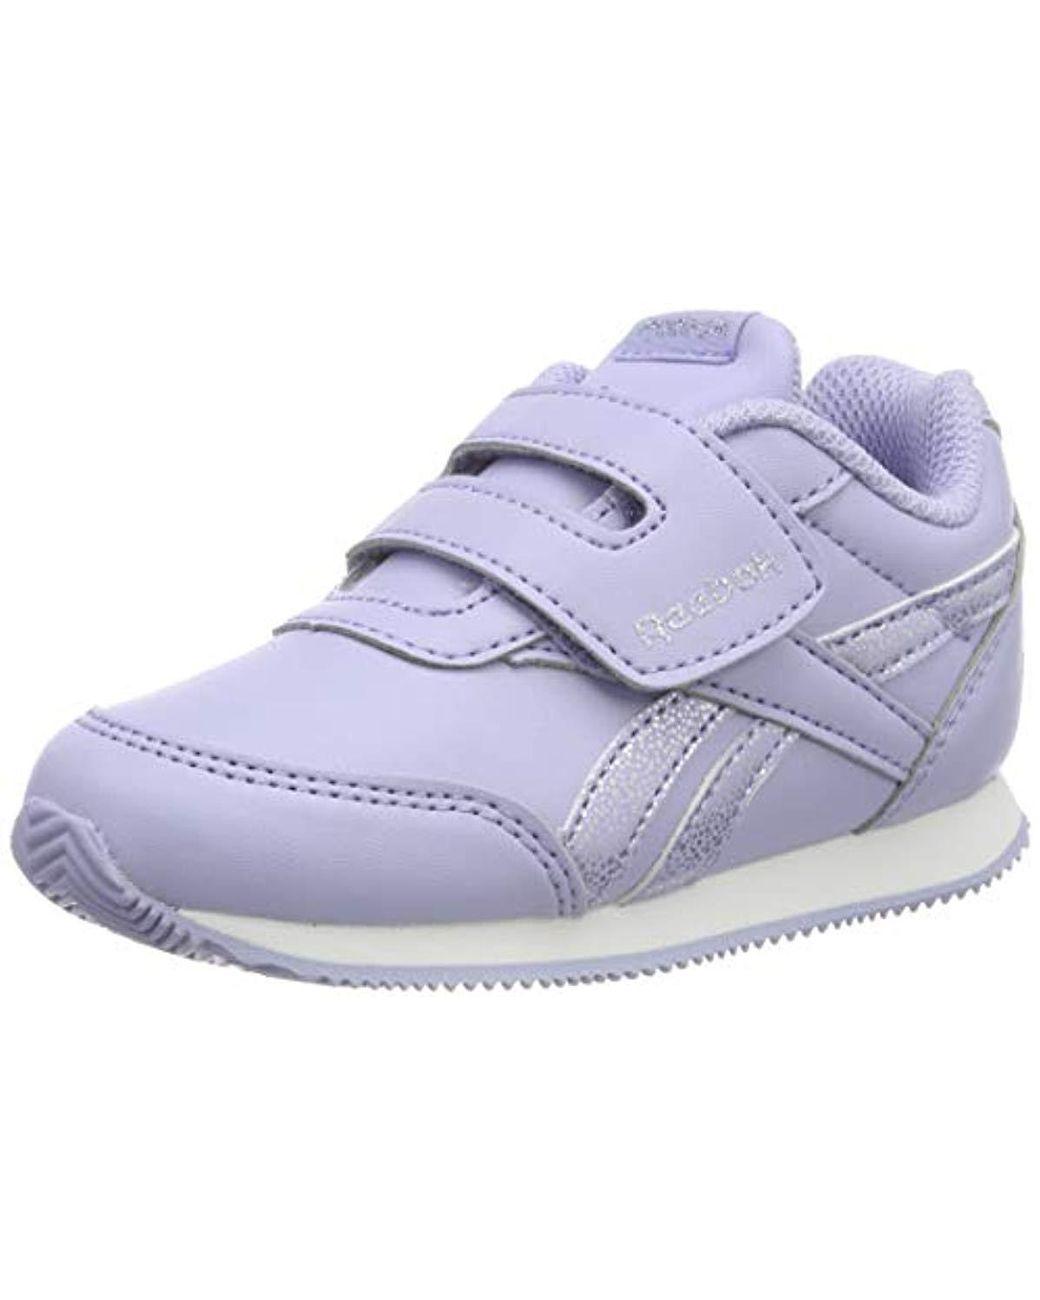 915f2dd37bea5 Reebok. Women s Infant s Royal Cljog 2 Kc Fitness Shoes